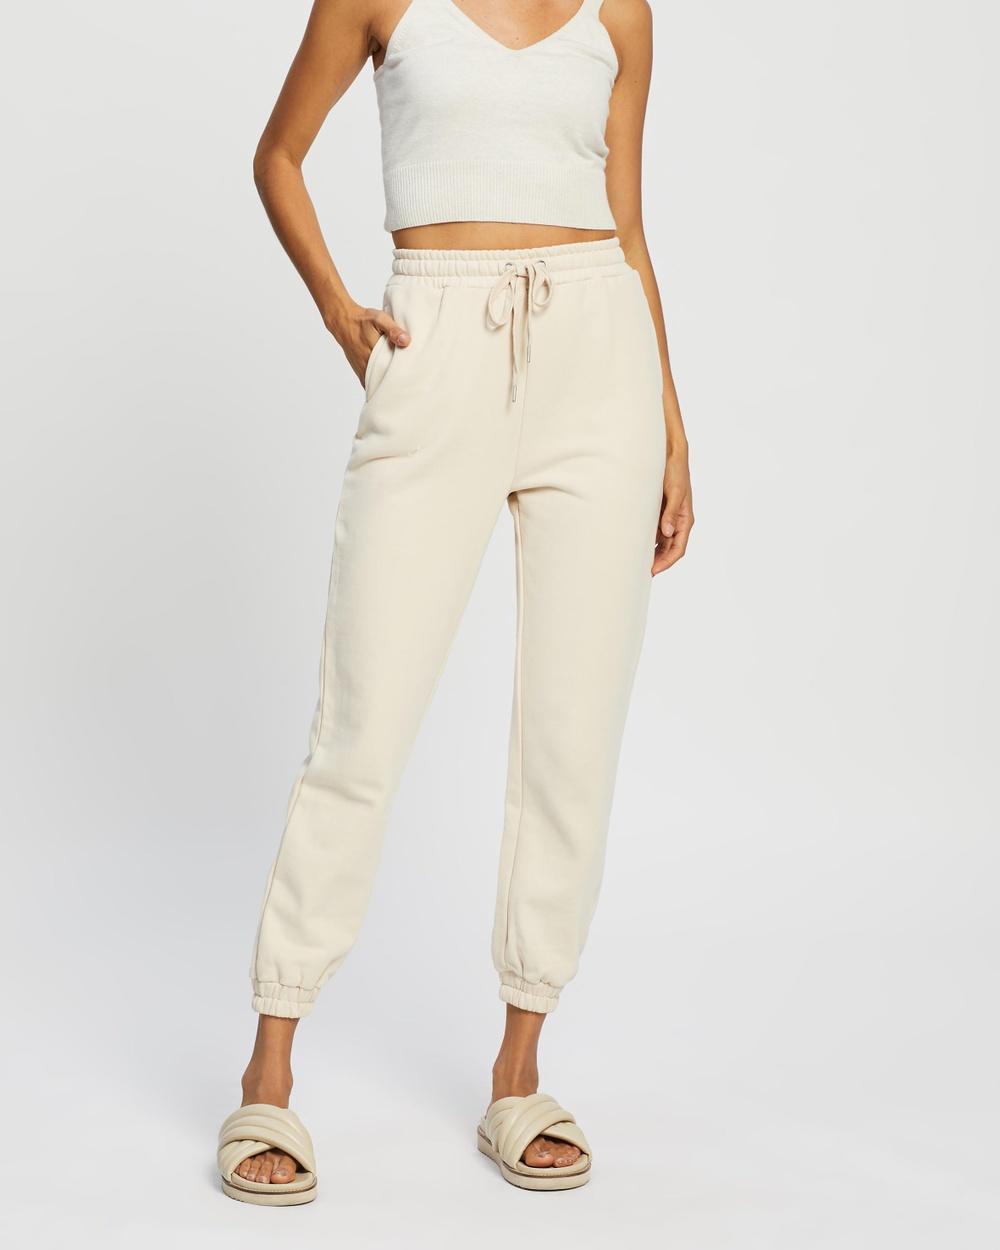 AERE Organic Cotton Slim Sweatpants Frosted Almond